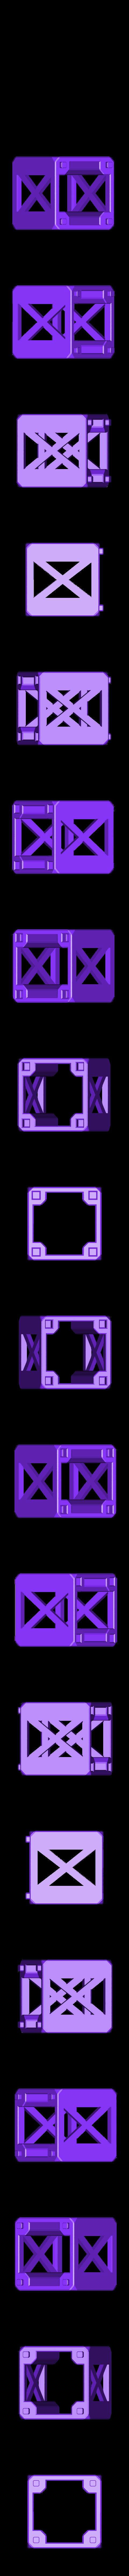 MarbleRunBlocks-BridgeSupport.stl Download STL file Marble Run Blocks - Extension pack • 3D printing design, Wabby